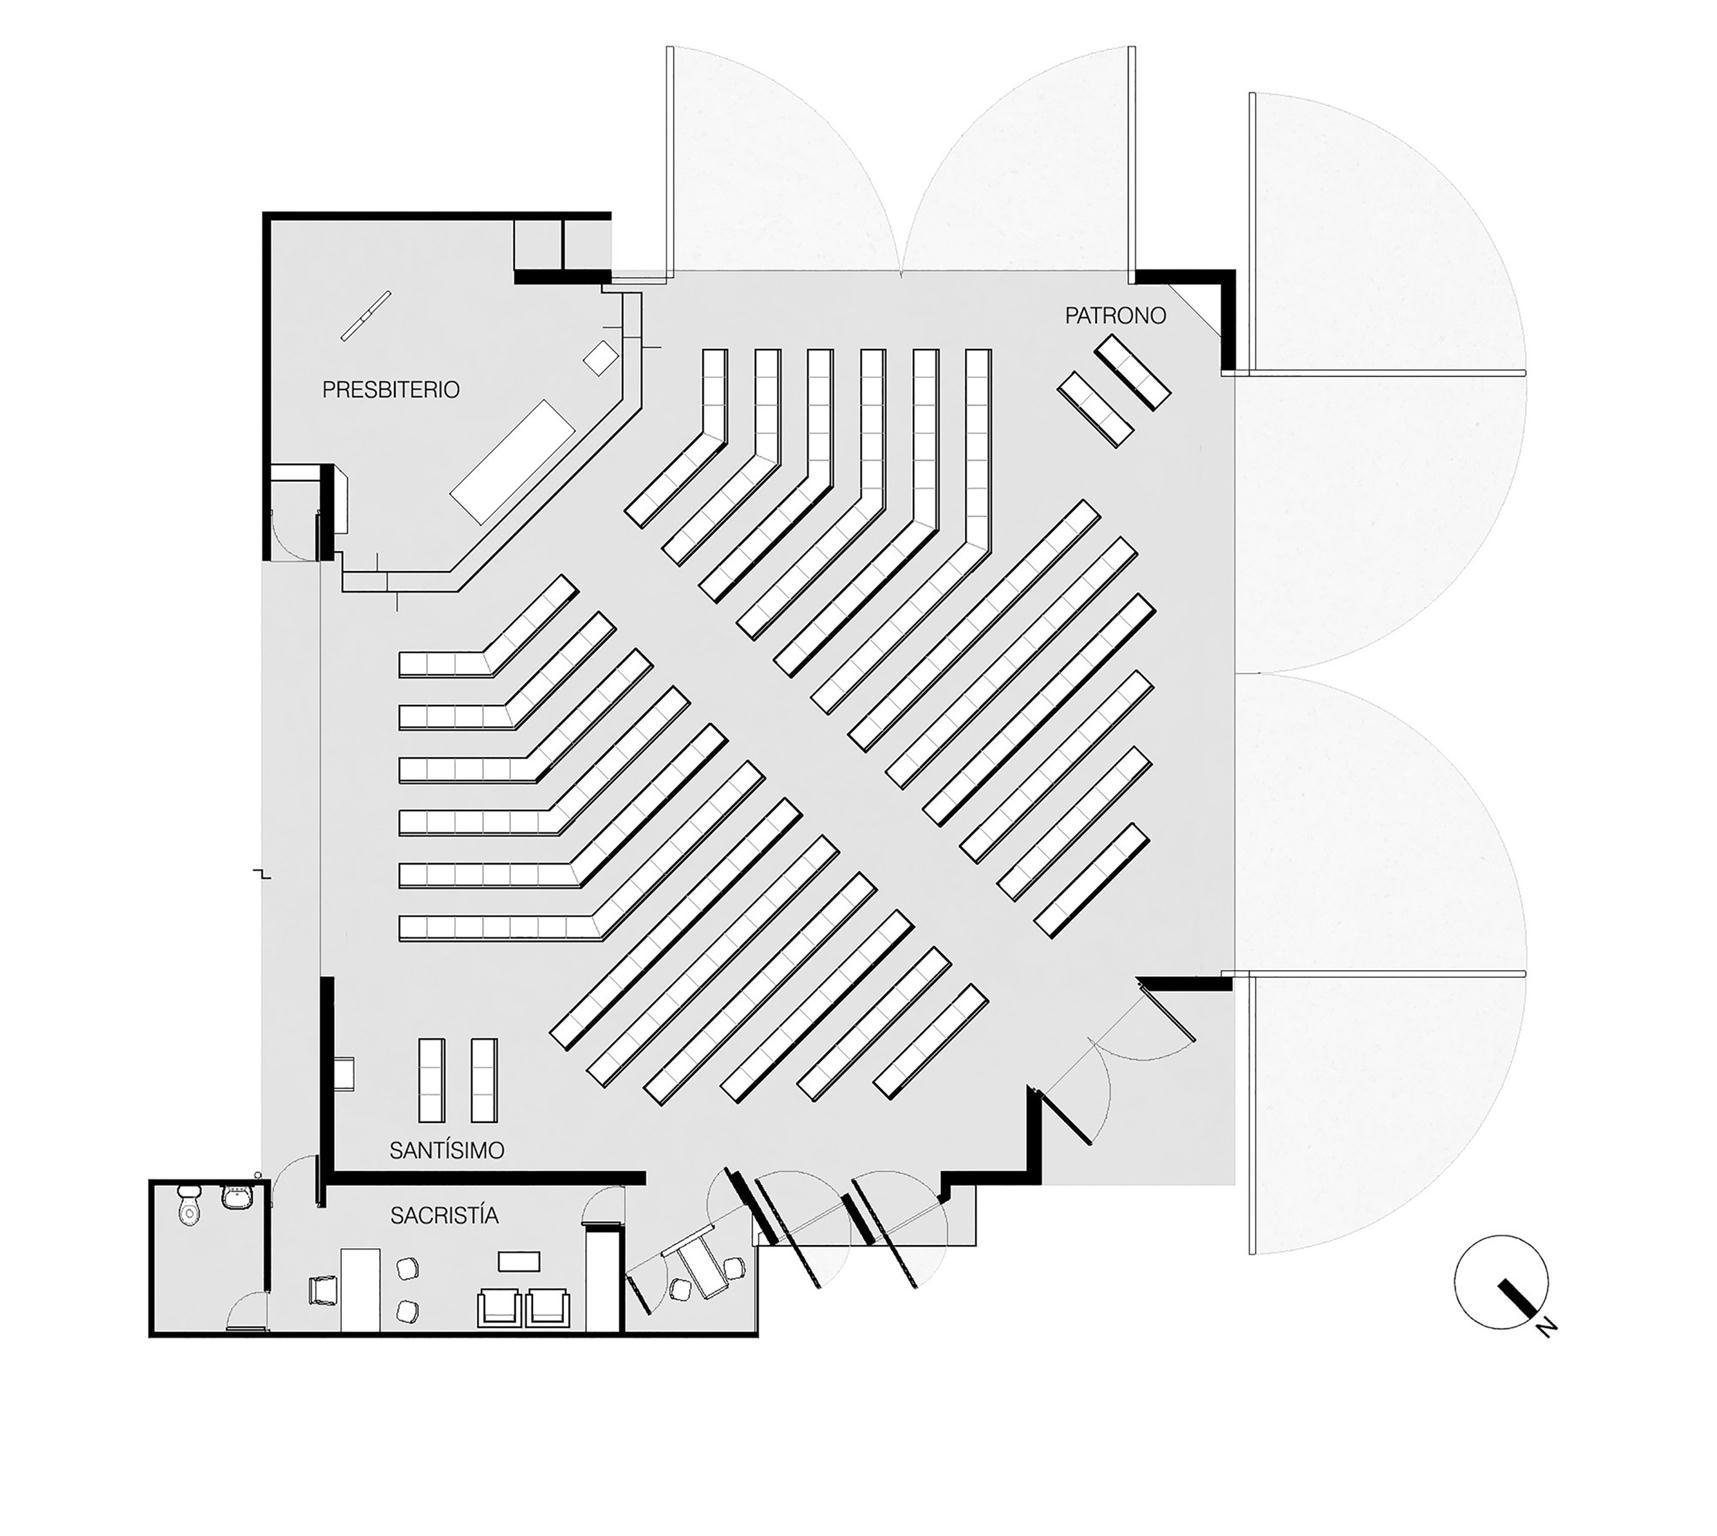 planta_capilla_2-Copy.jpg